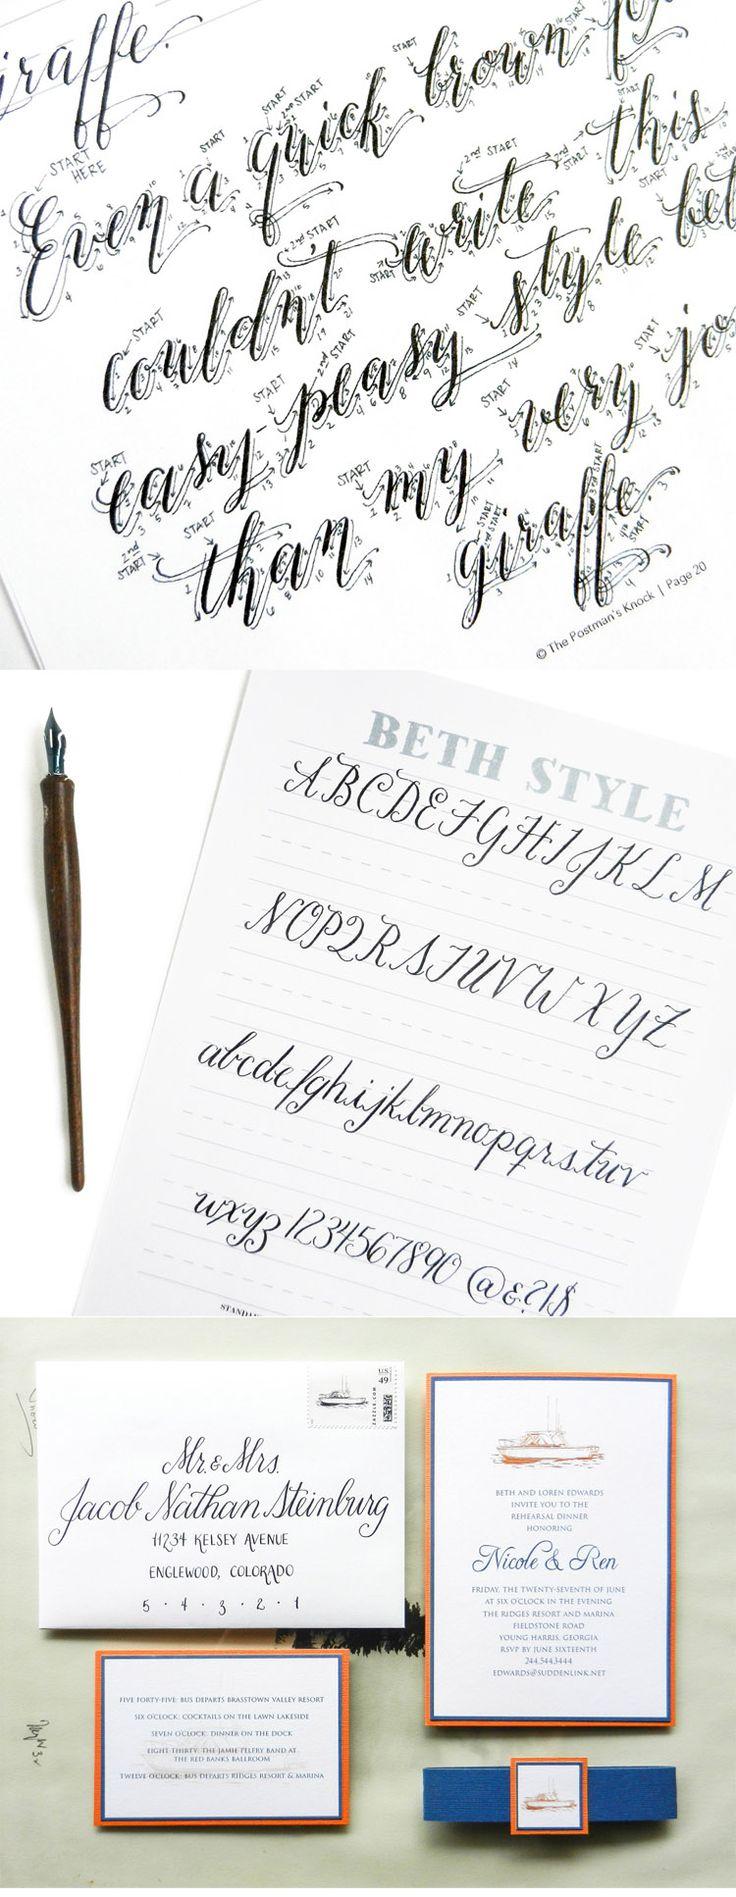 Beth Style Free Calligraphy Worksheet ( https://thepostmansknock.com/beth-style-free-calligraphy-worksheet/ )